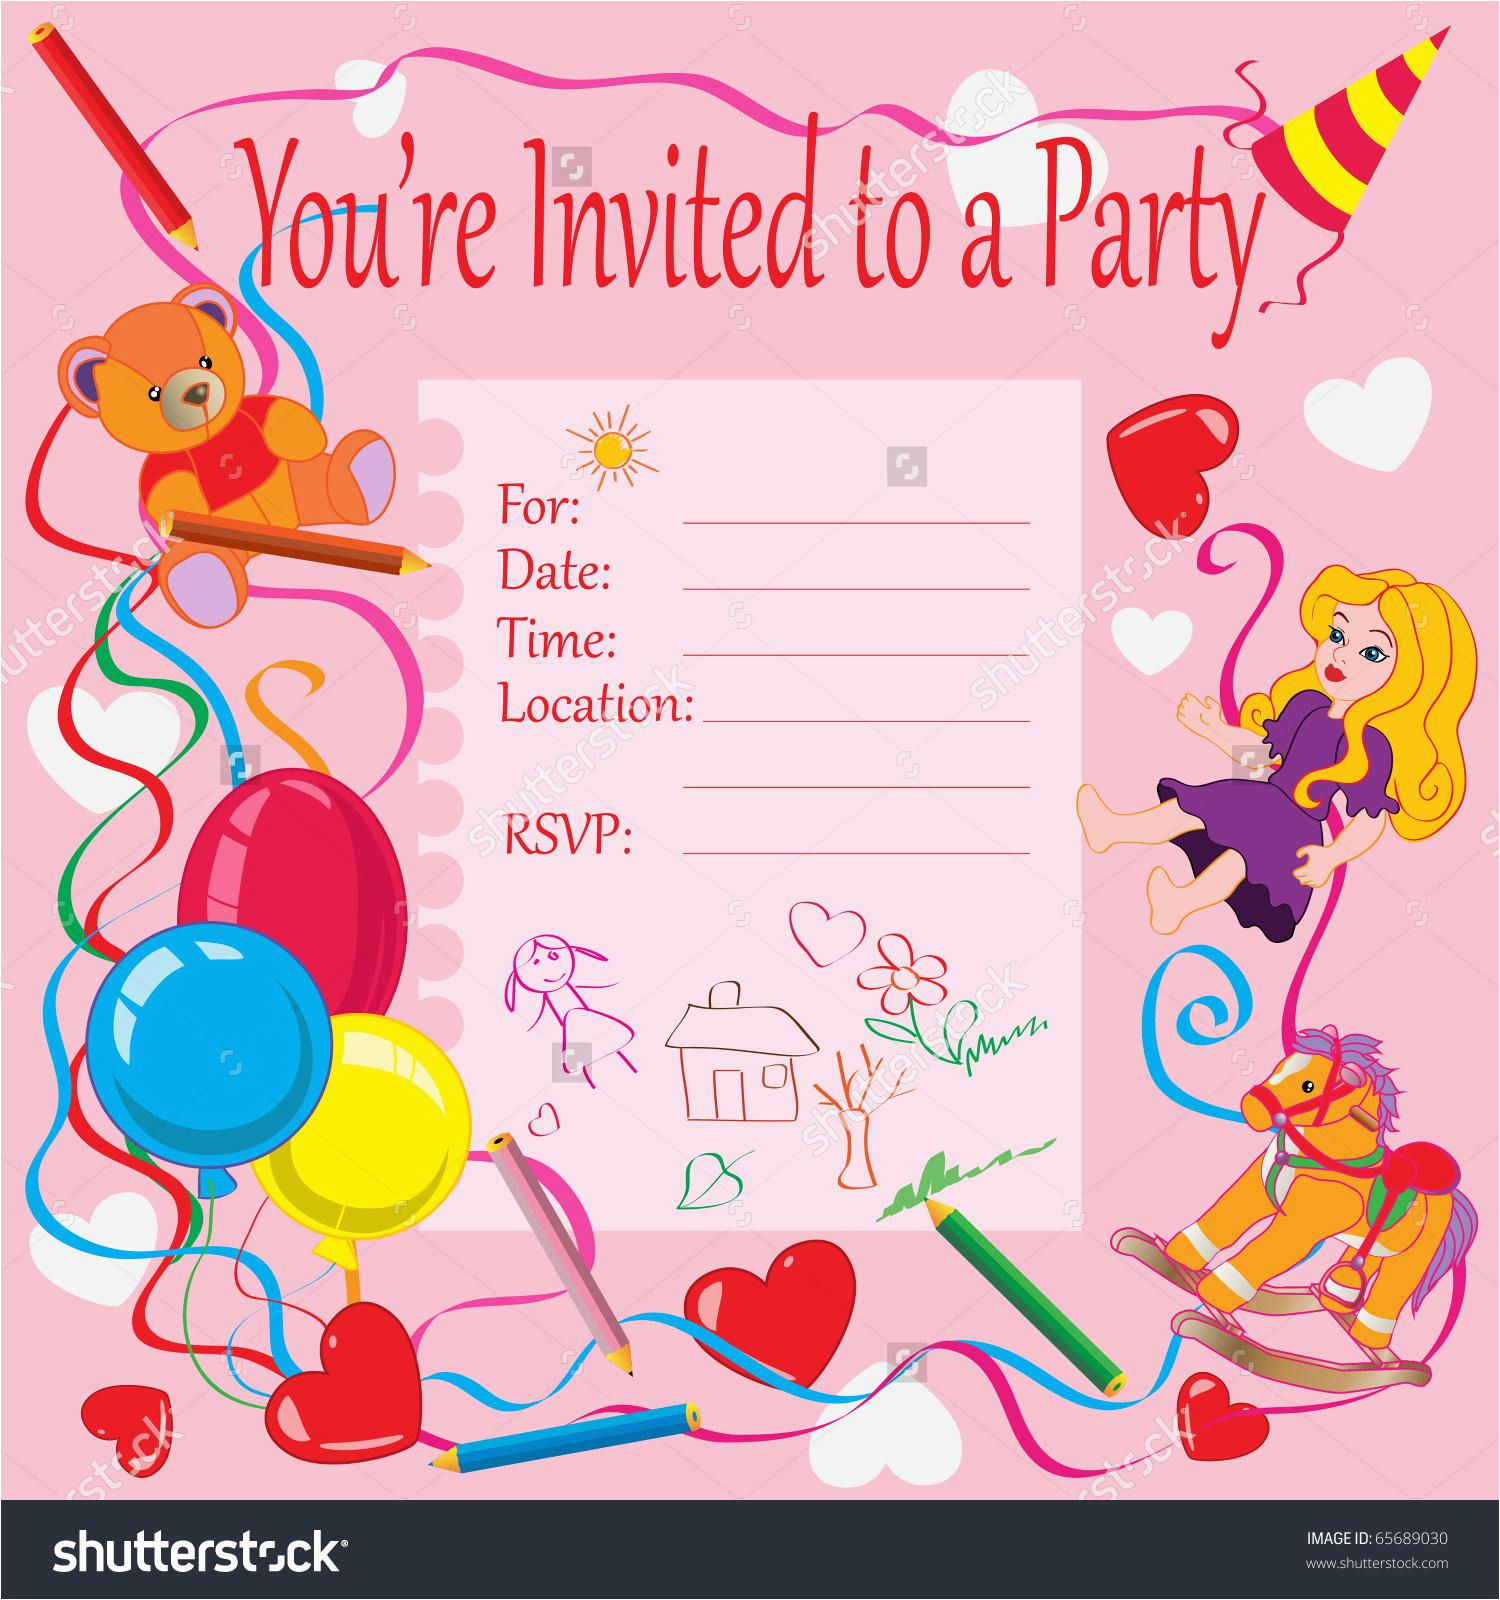 Make Birthday Invitations Online Free Printable Make Your Own - Make Your Own Birthday Party Invitations Free Printable